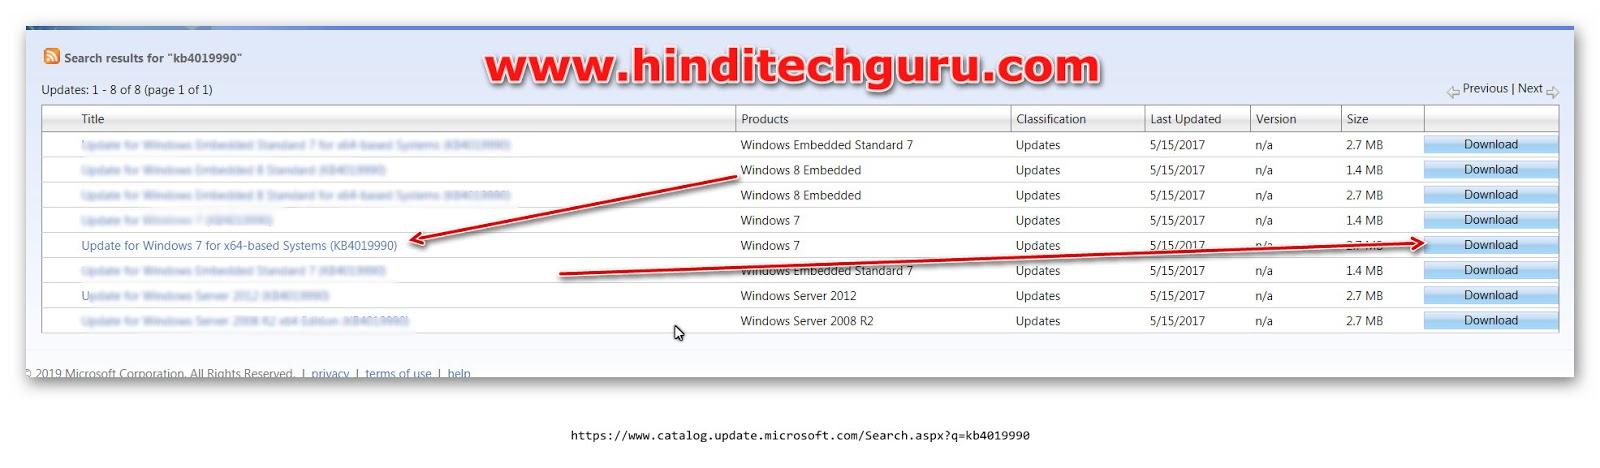 d3dcompiler_47.dll windows 7 missing